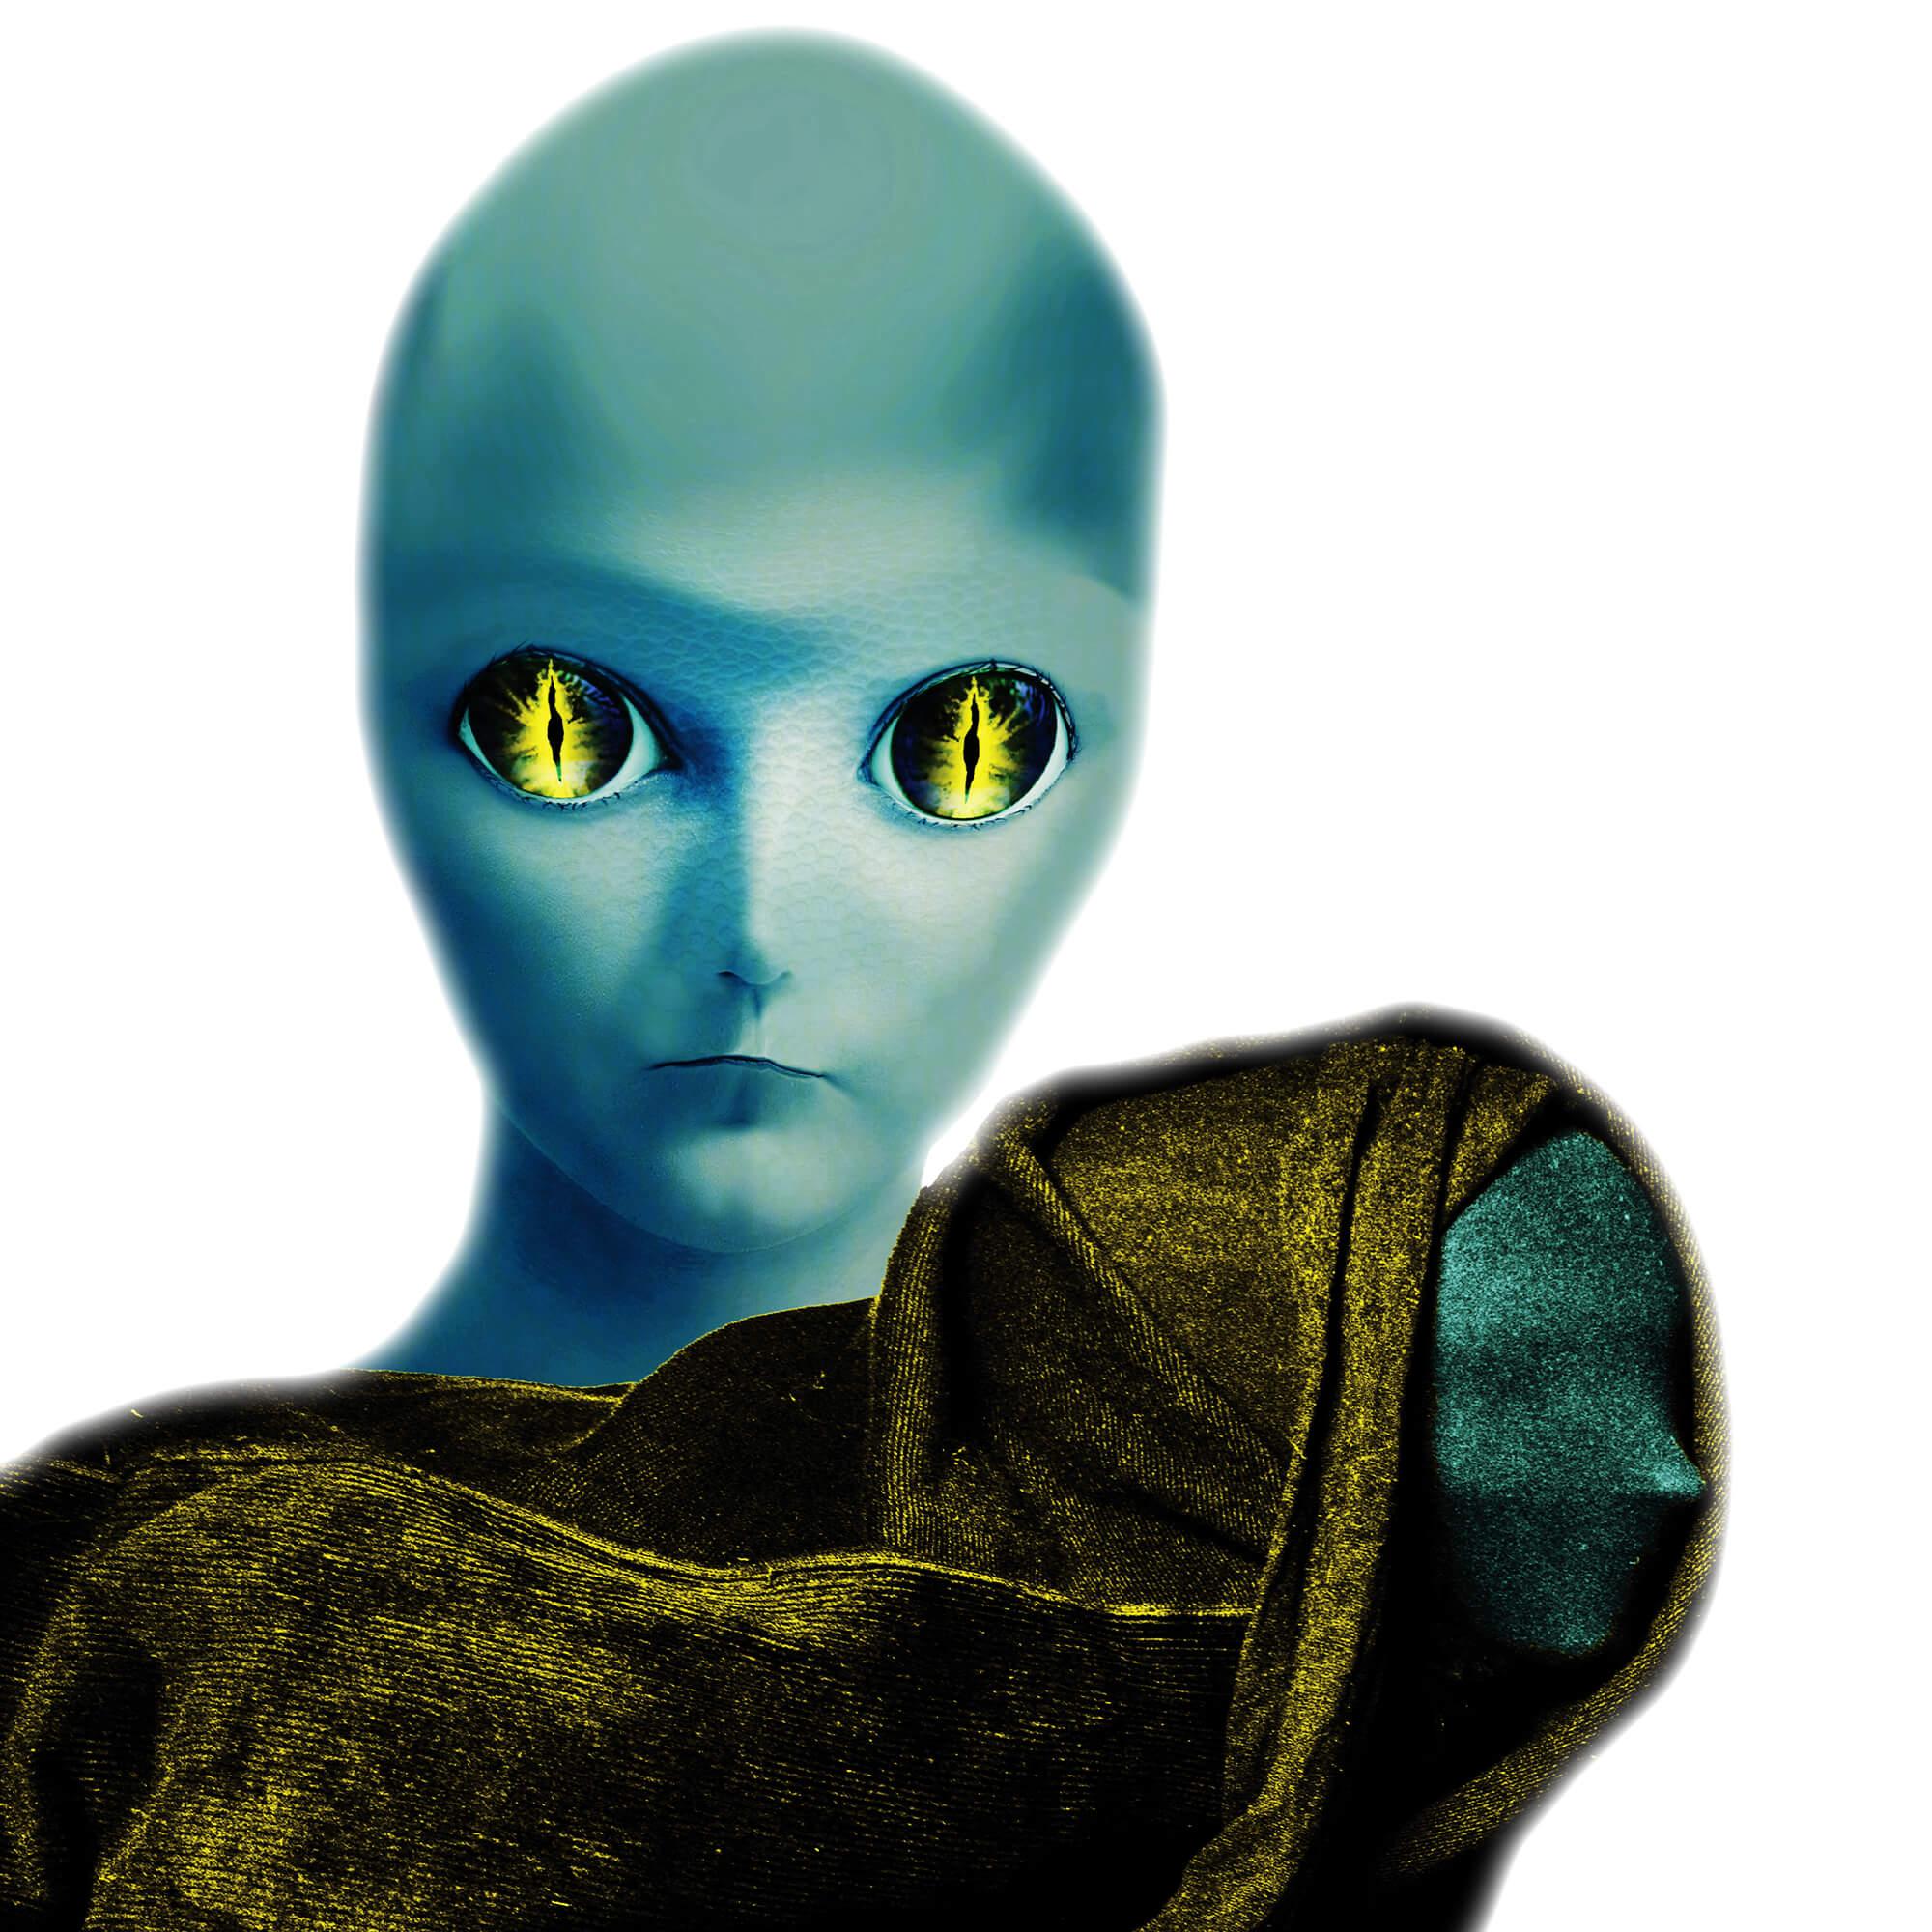 Gothic Zen™ Studios Alien with child Goran Zivanovic